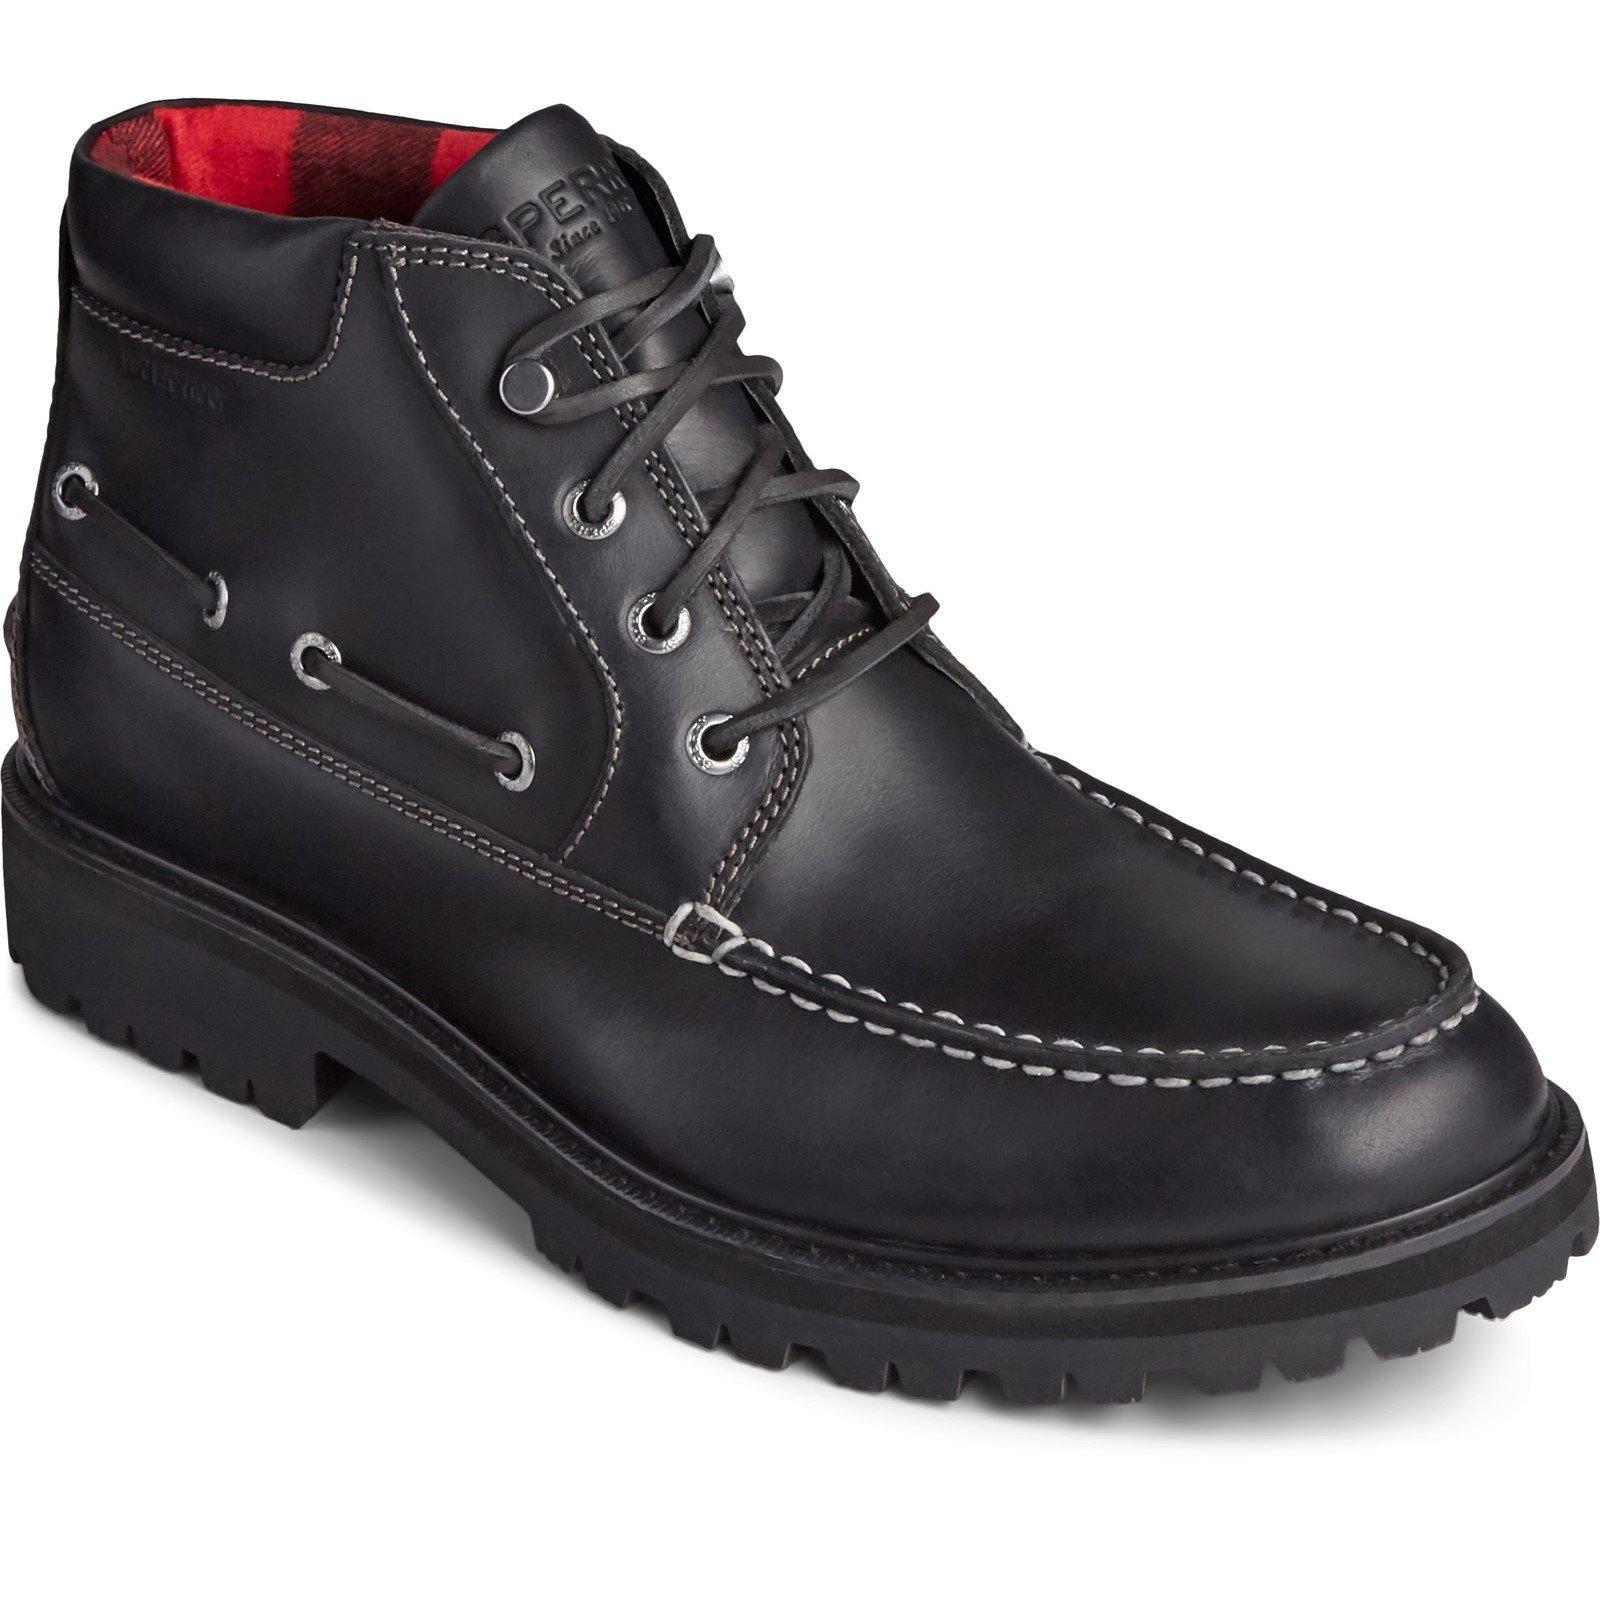 Sperry Men's Authentic Original Lug Chukka Boot Various Colours 32068 - Black 11